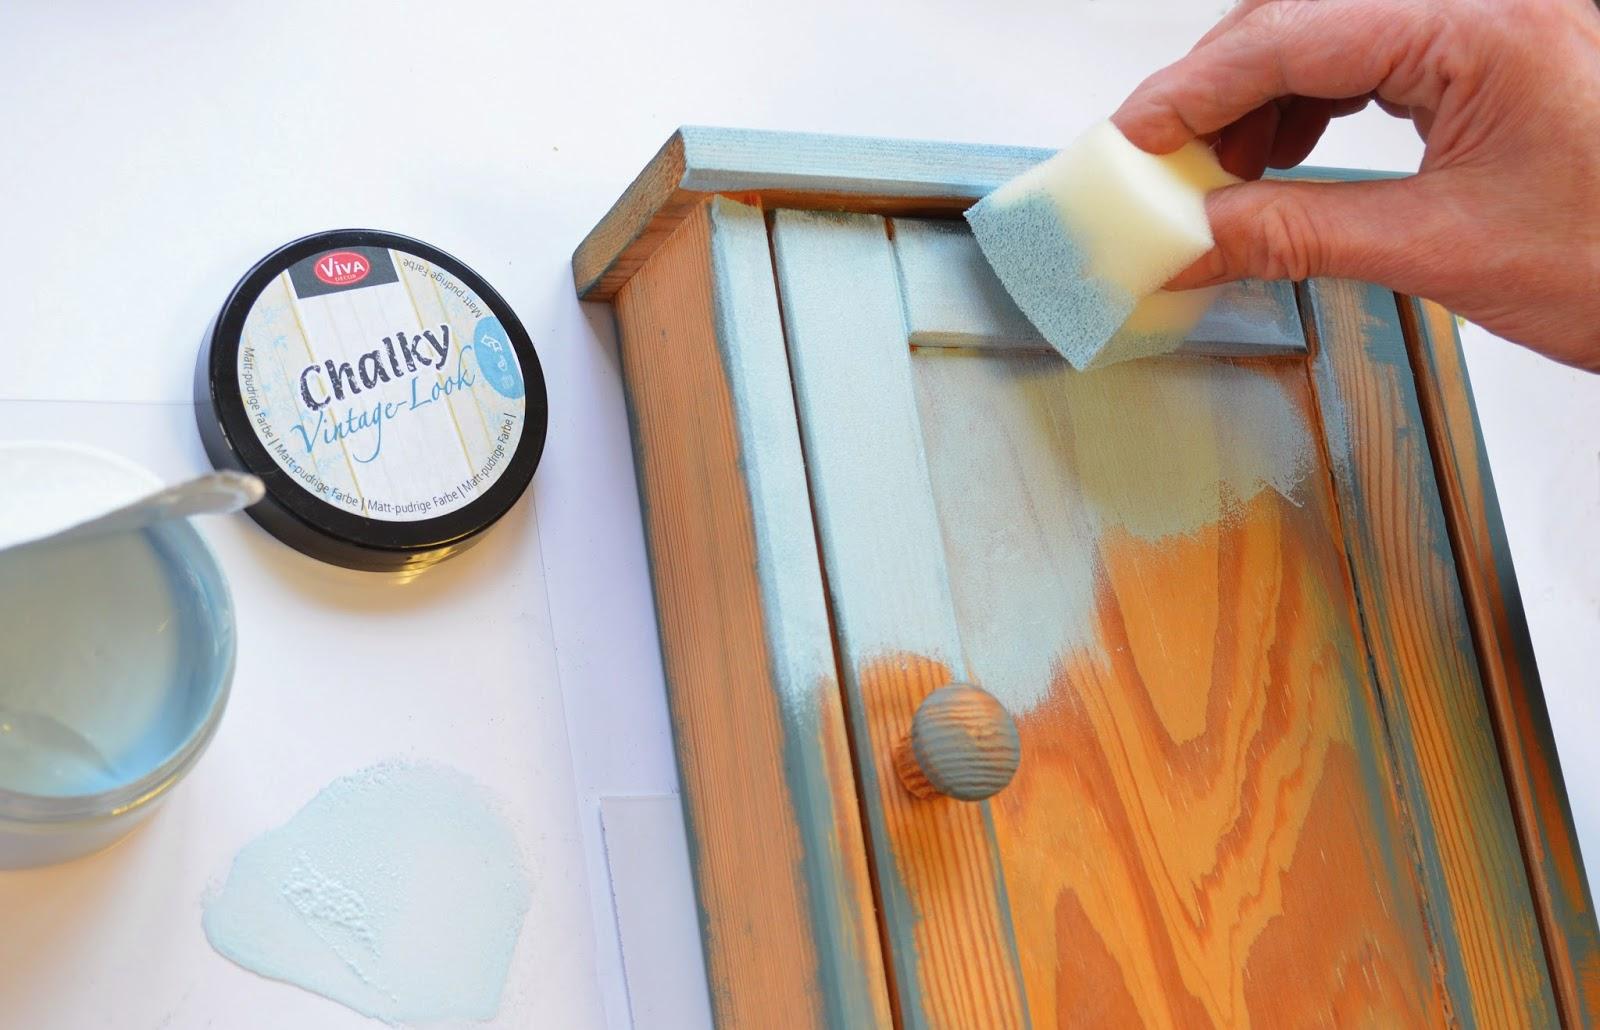 shabby chic farbe / kreidefarbe | blog |